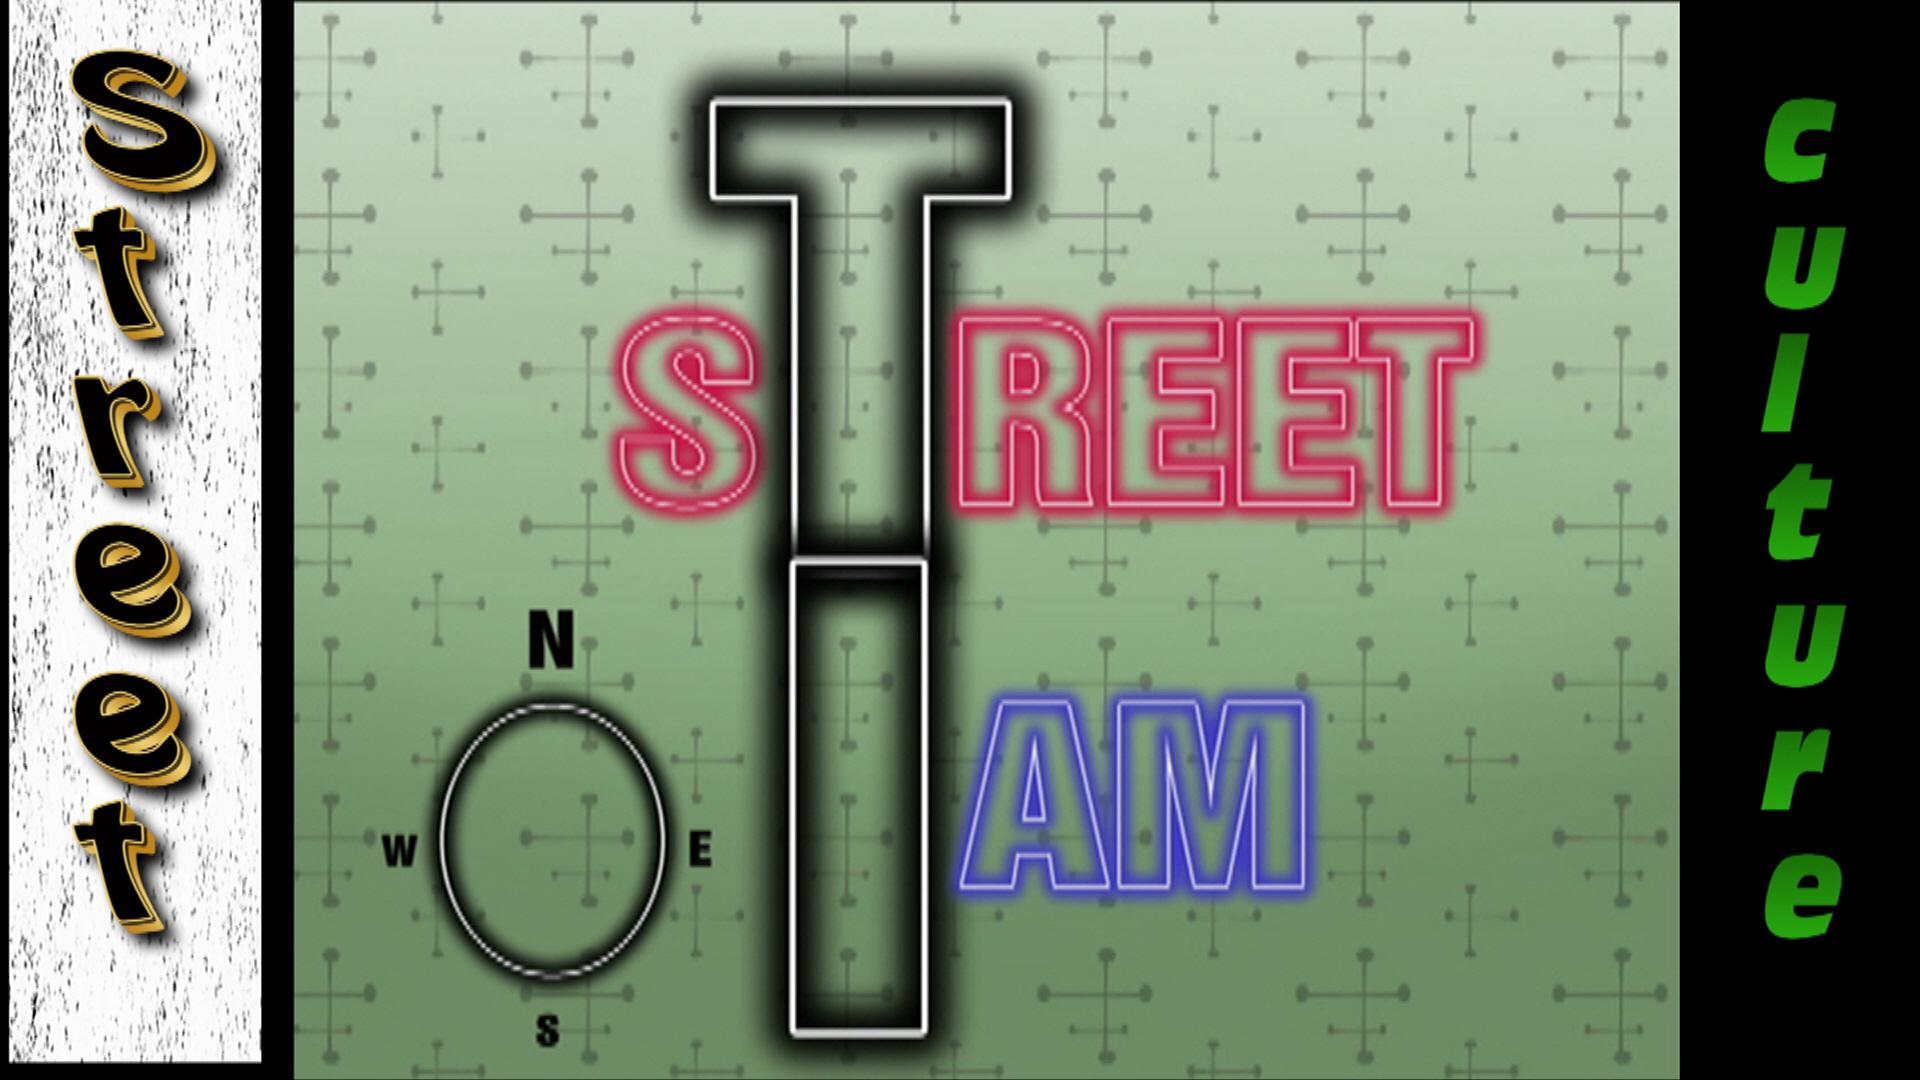 1_street i am_logo.jpg